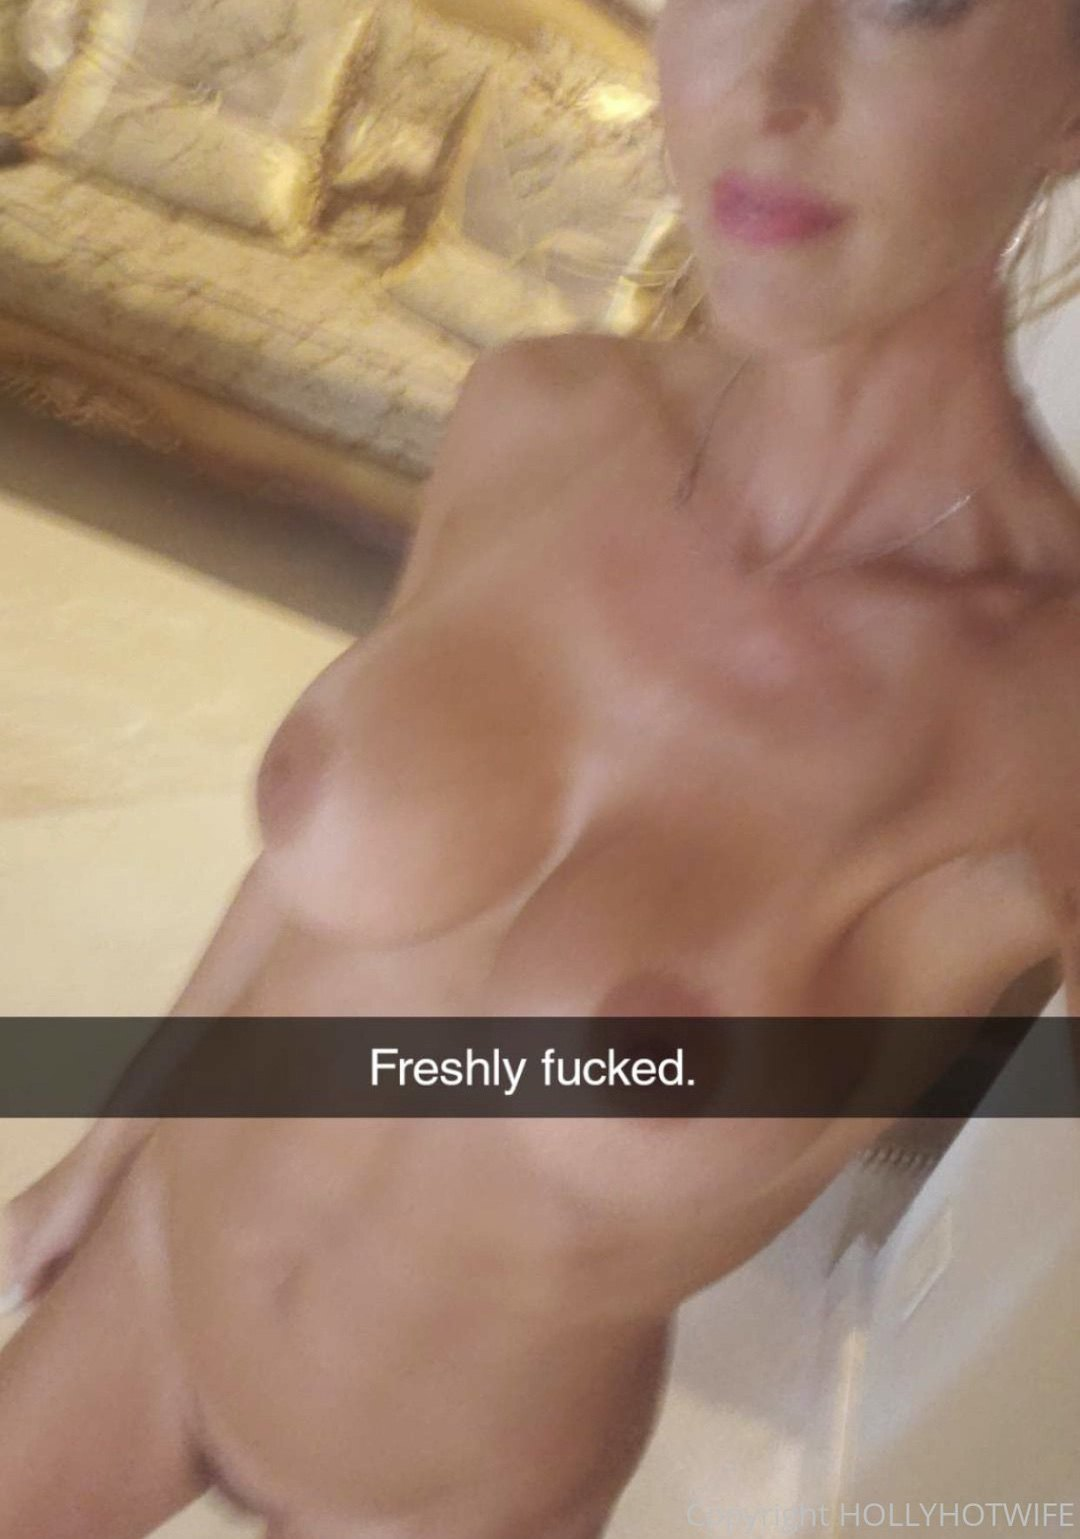 Hollyhotwife Onlyfans Nudes Leaks 0014